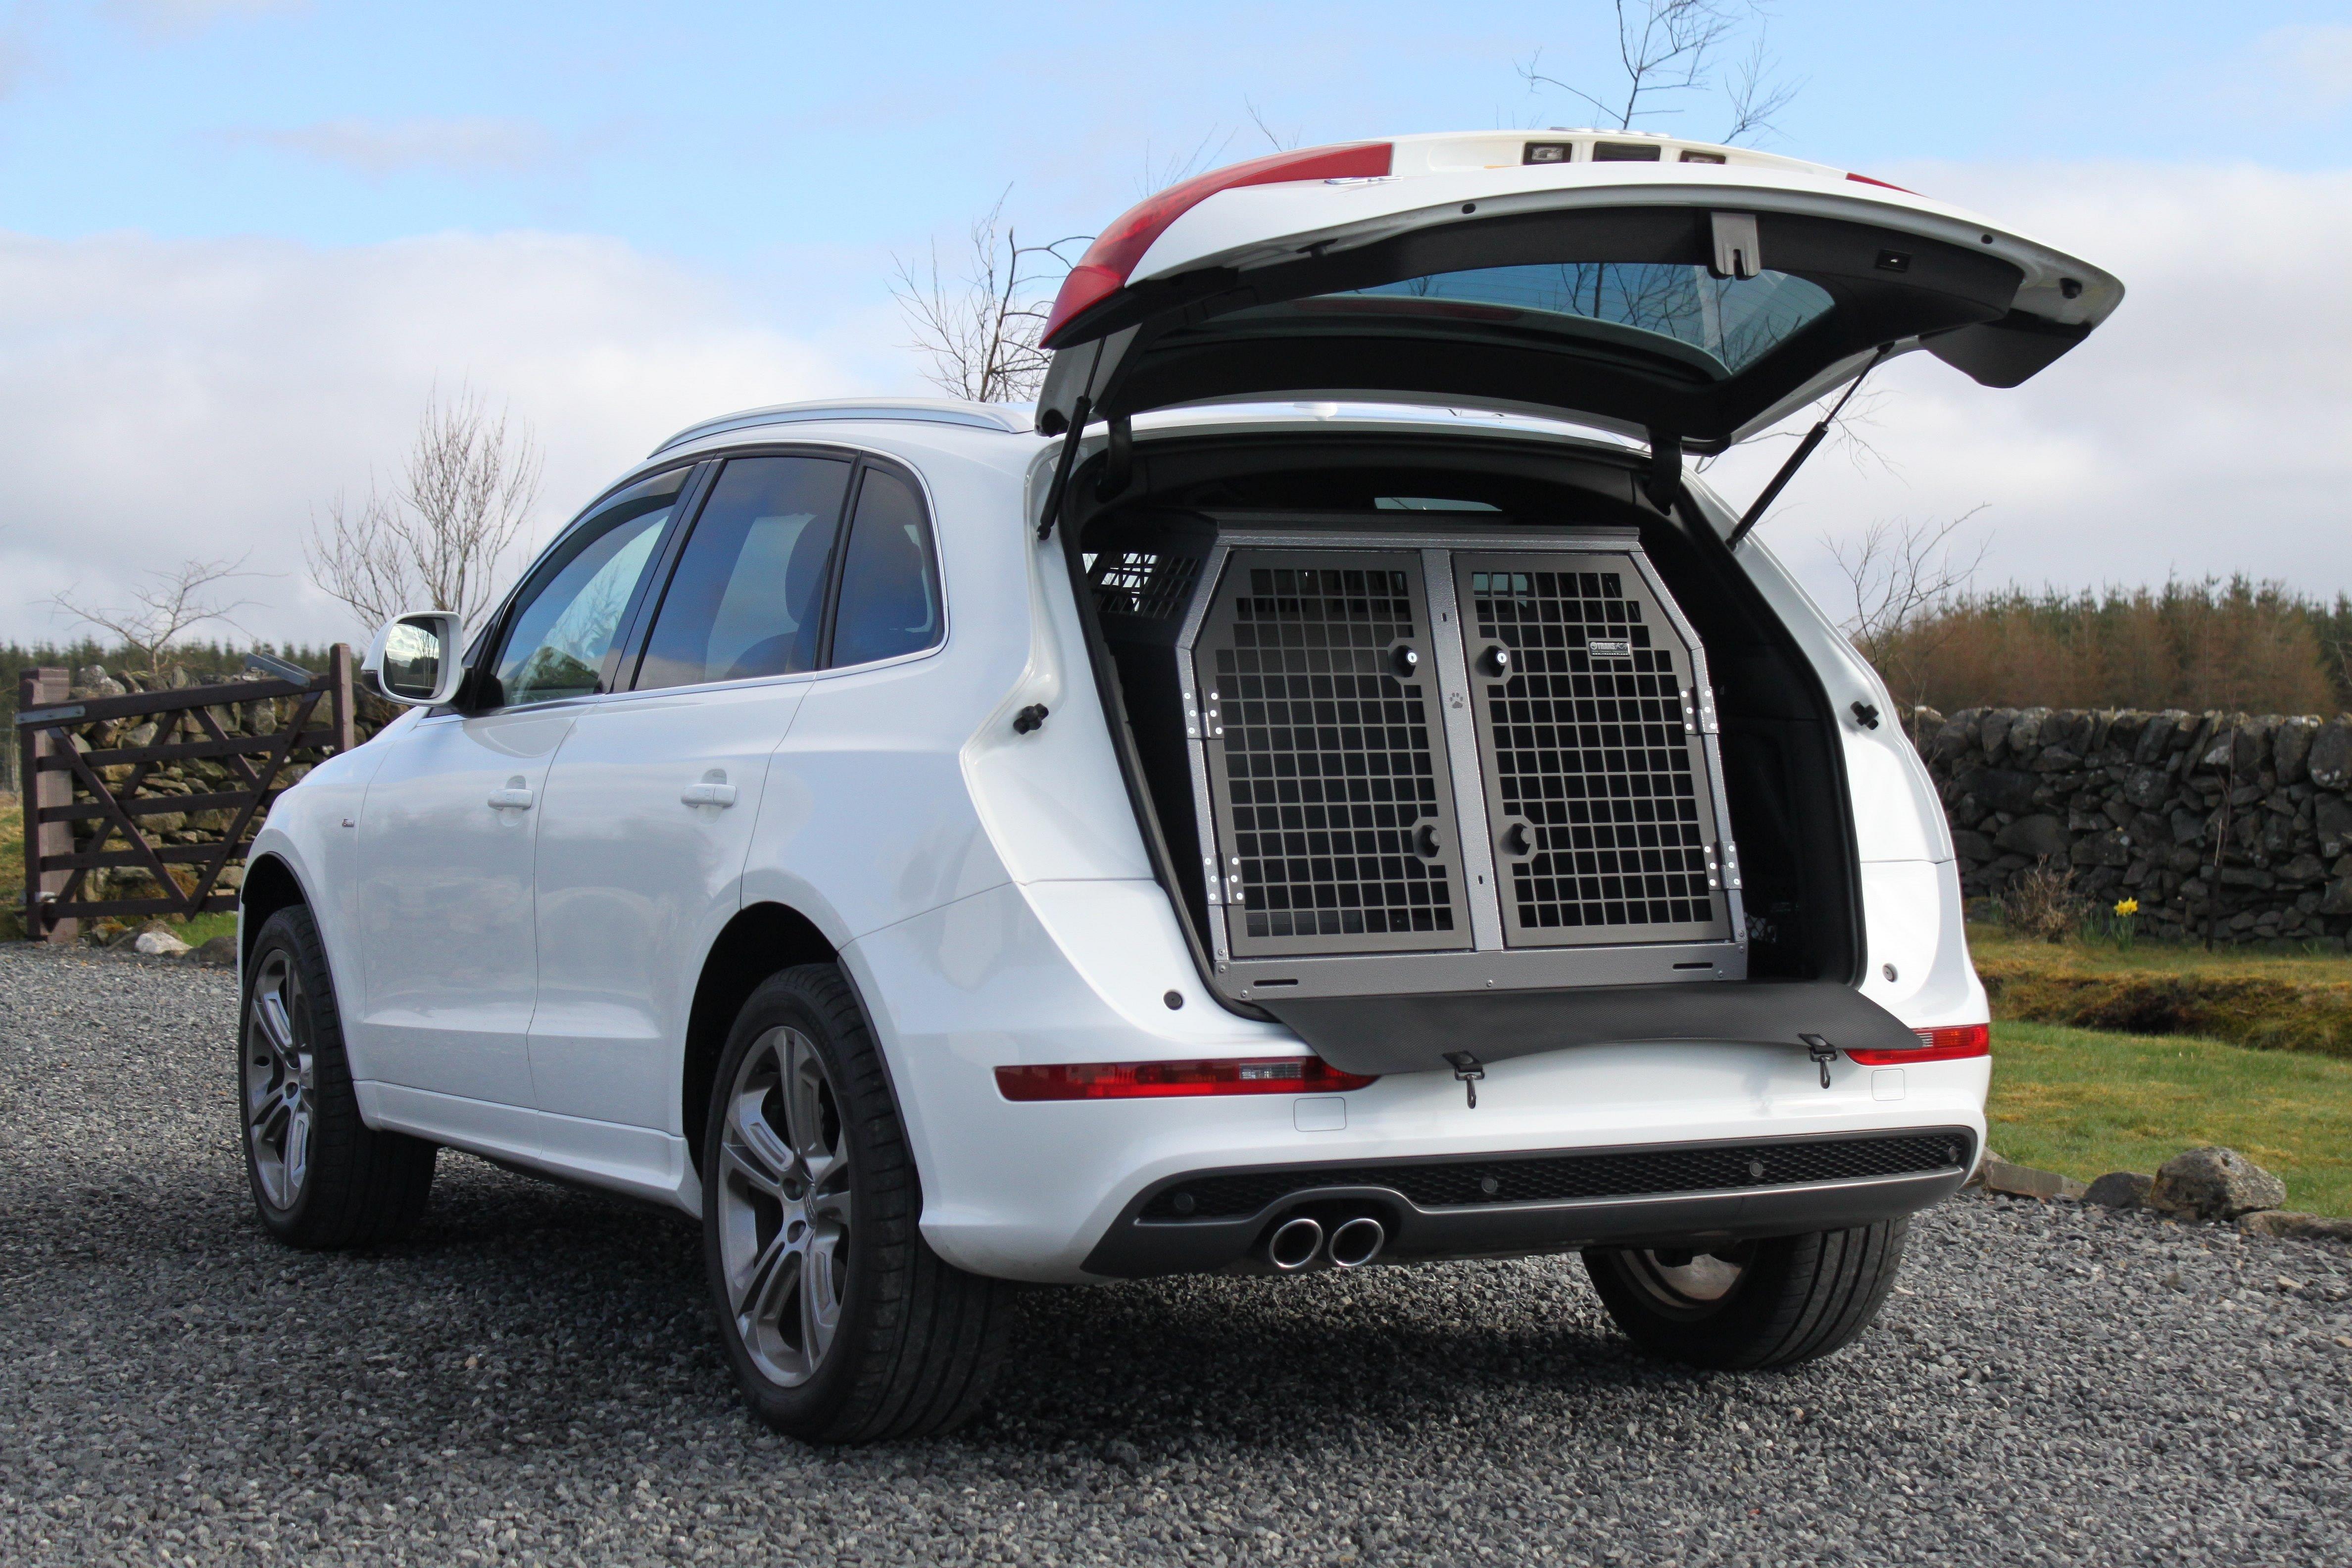 Transk9 B13 Audi Q5 Dog Crate Dog Transit Box Dog Cage Www Transk9